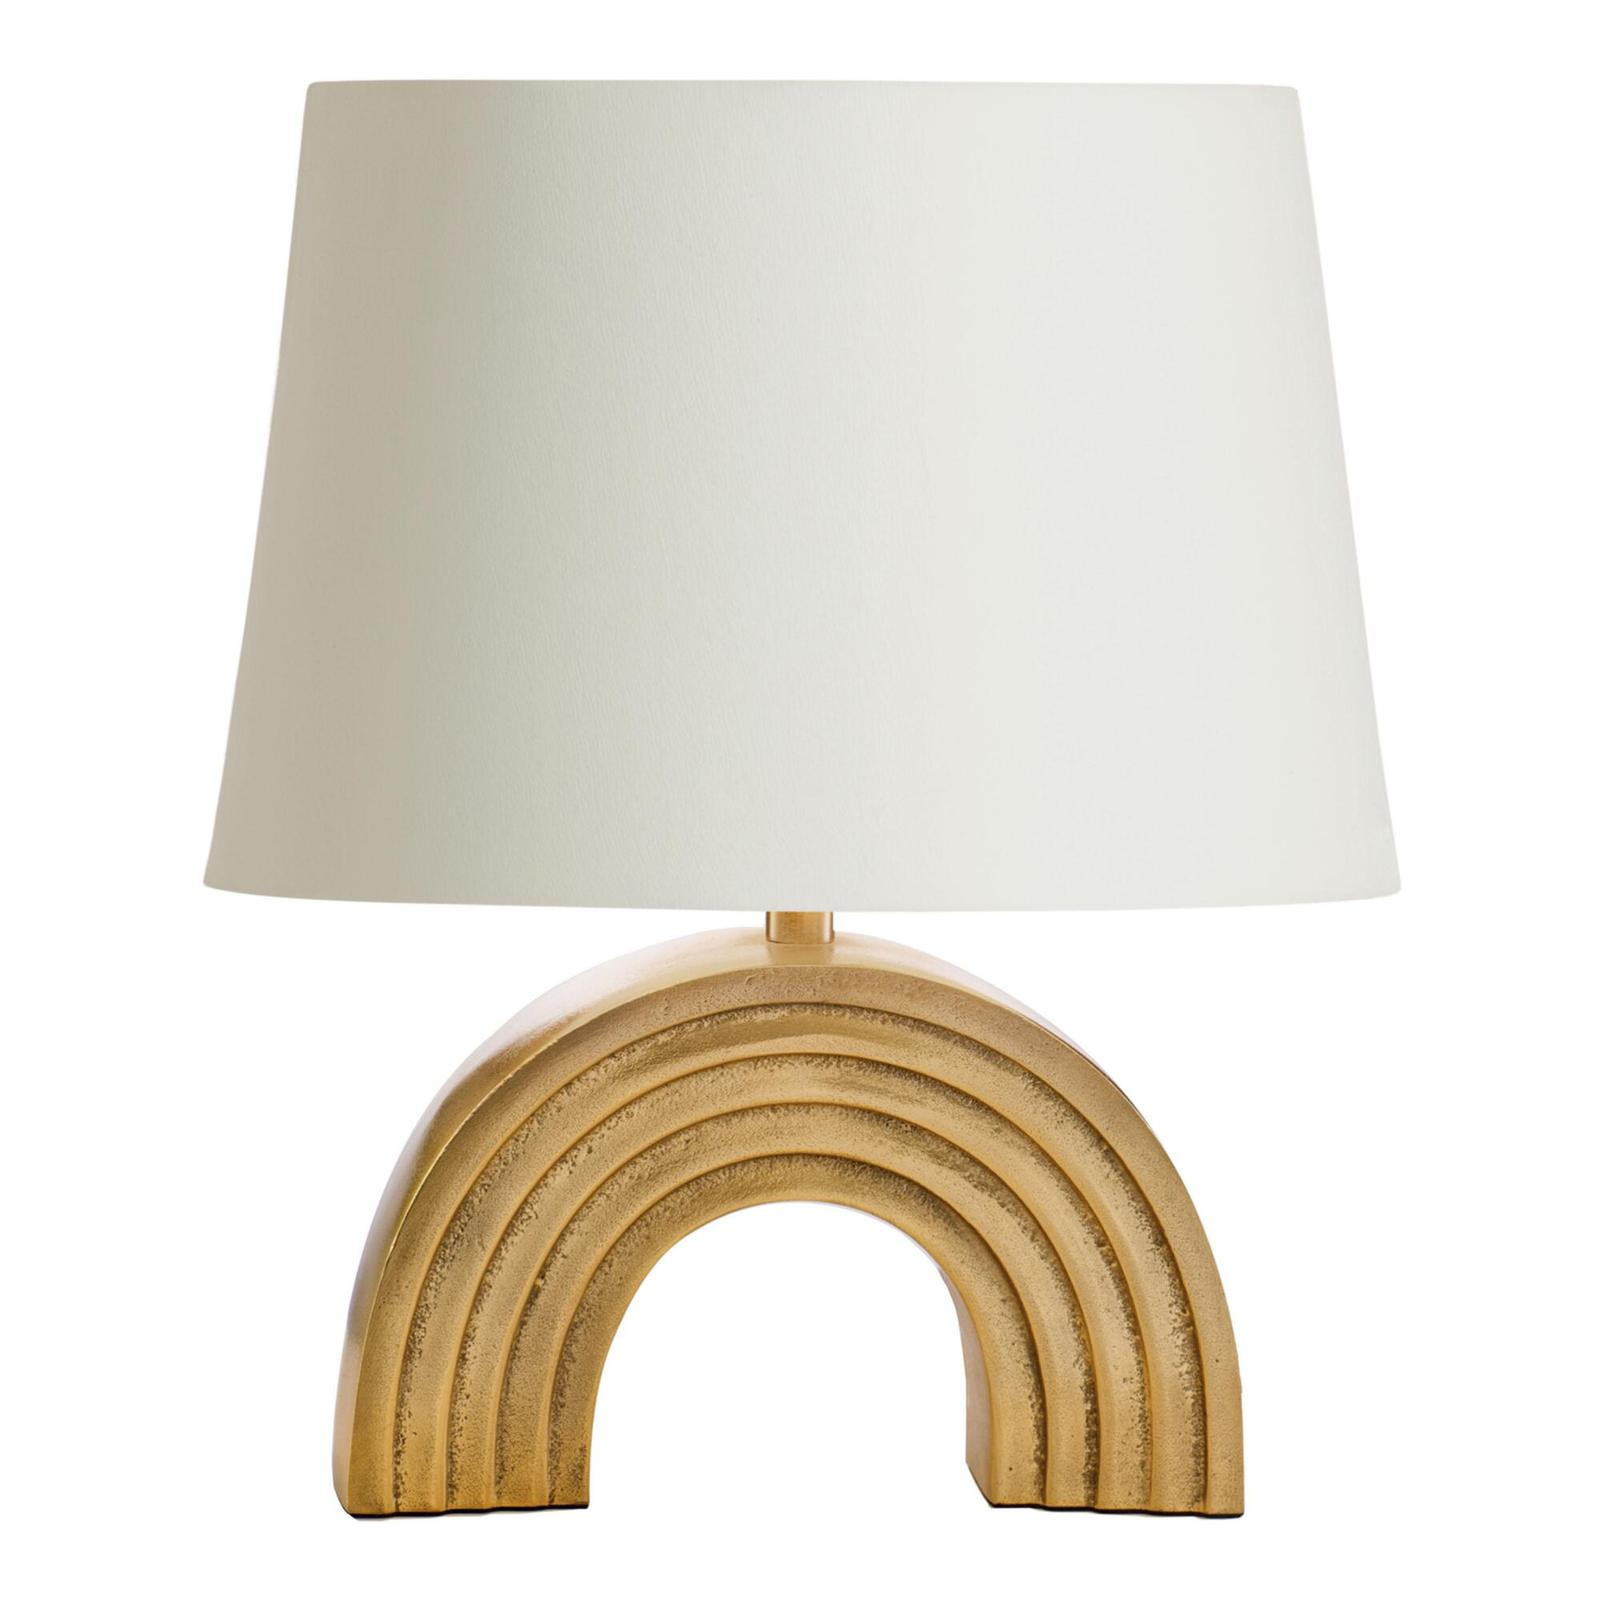 Stylish Gold Rainbow Lamp